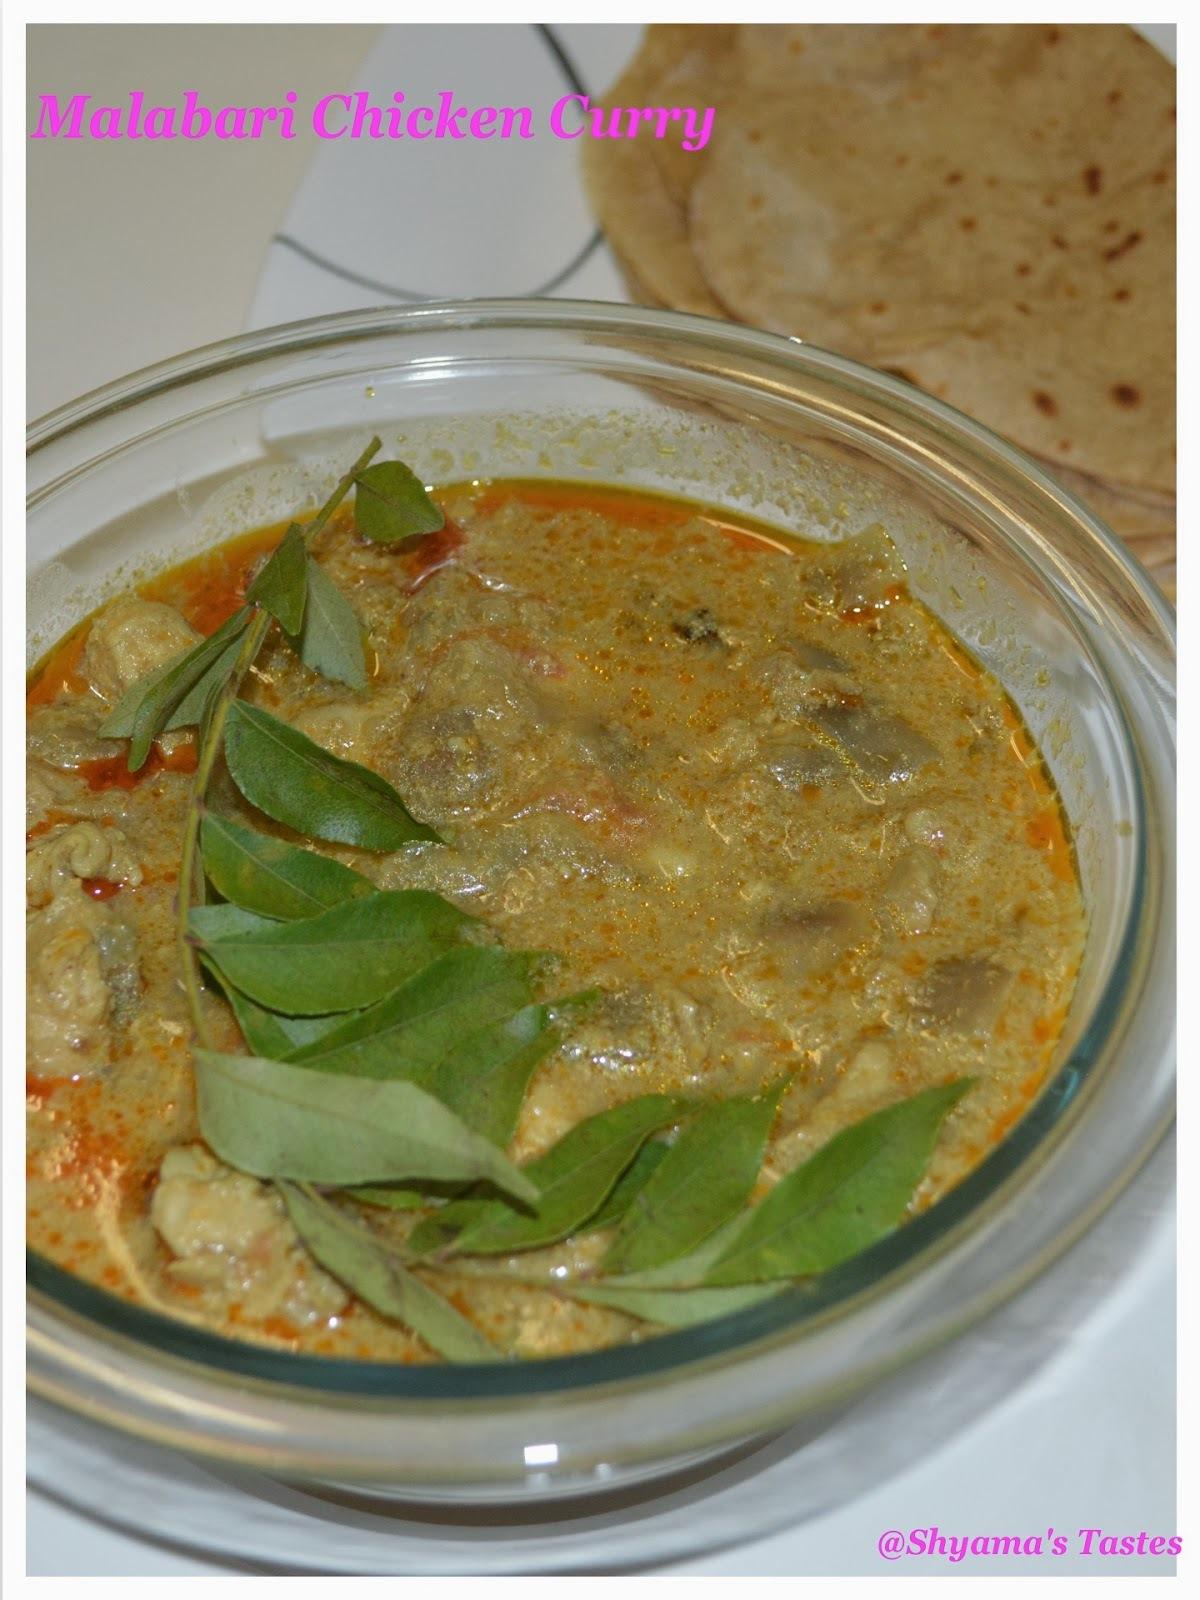 Malabari Chicken Curry